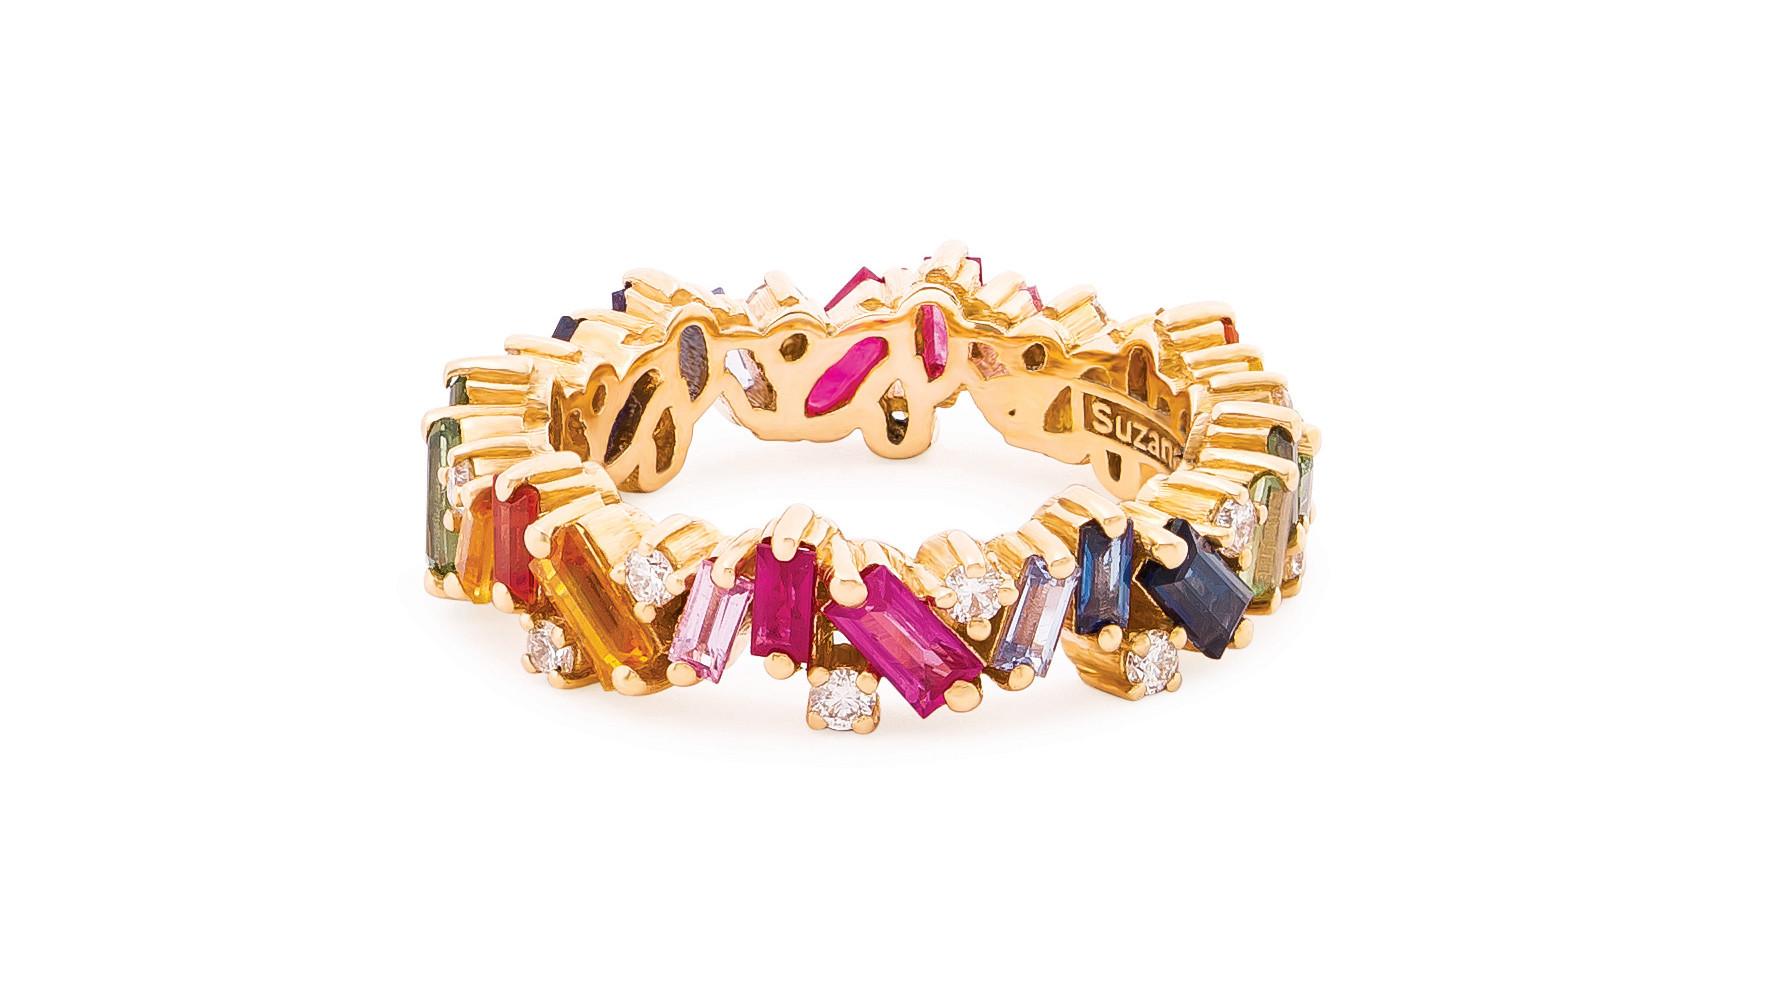 Suzanne Kalan 18-karat yellow gold Rainbow Eternity Band with 2.1 carats of rainbow sapphire baguett